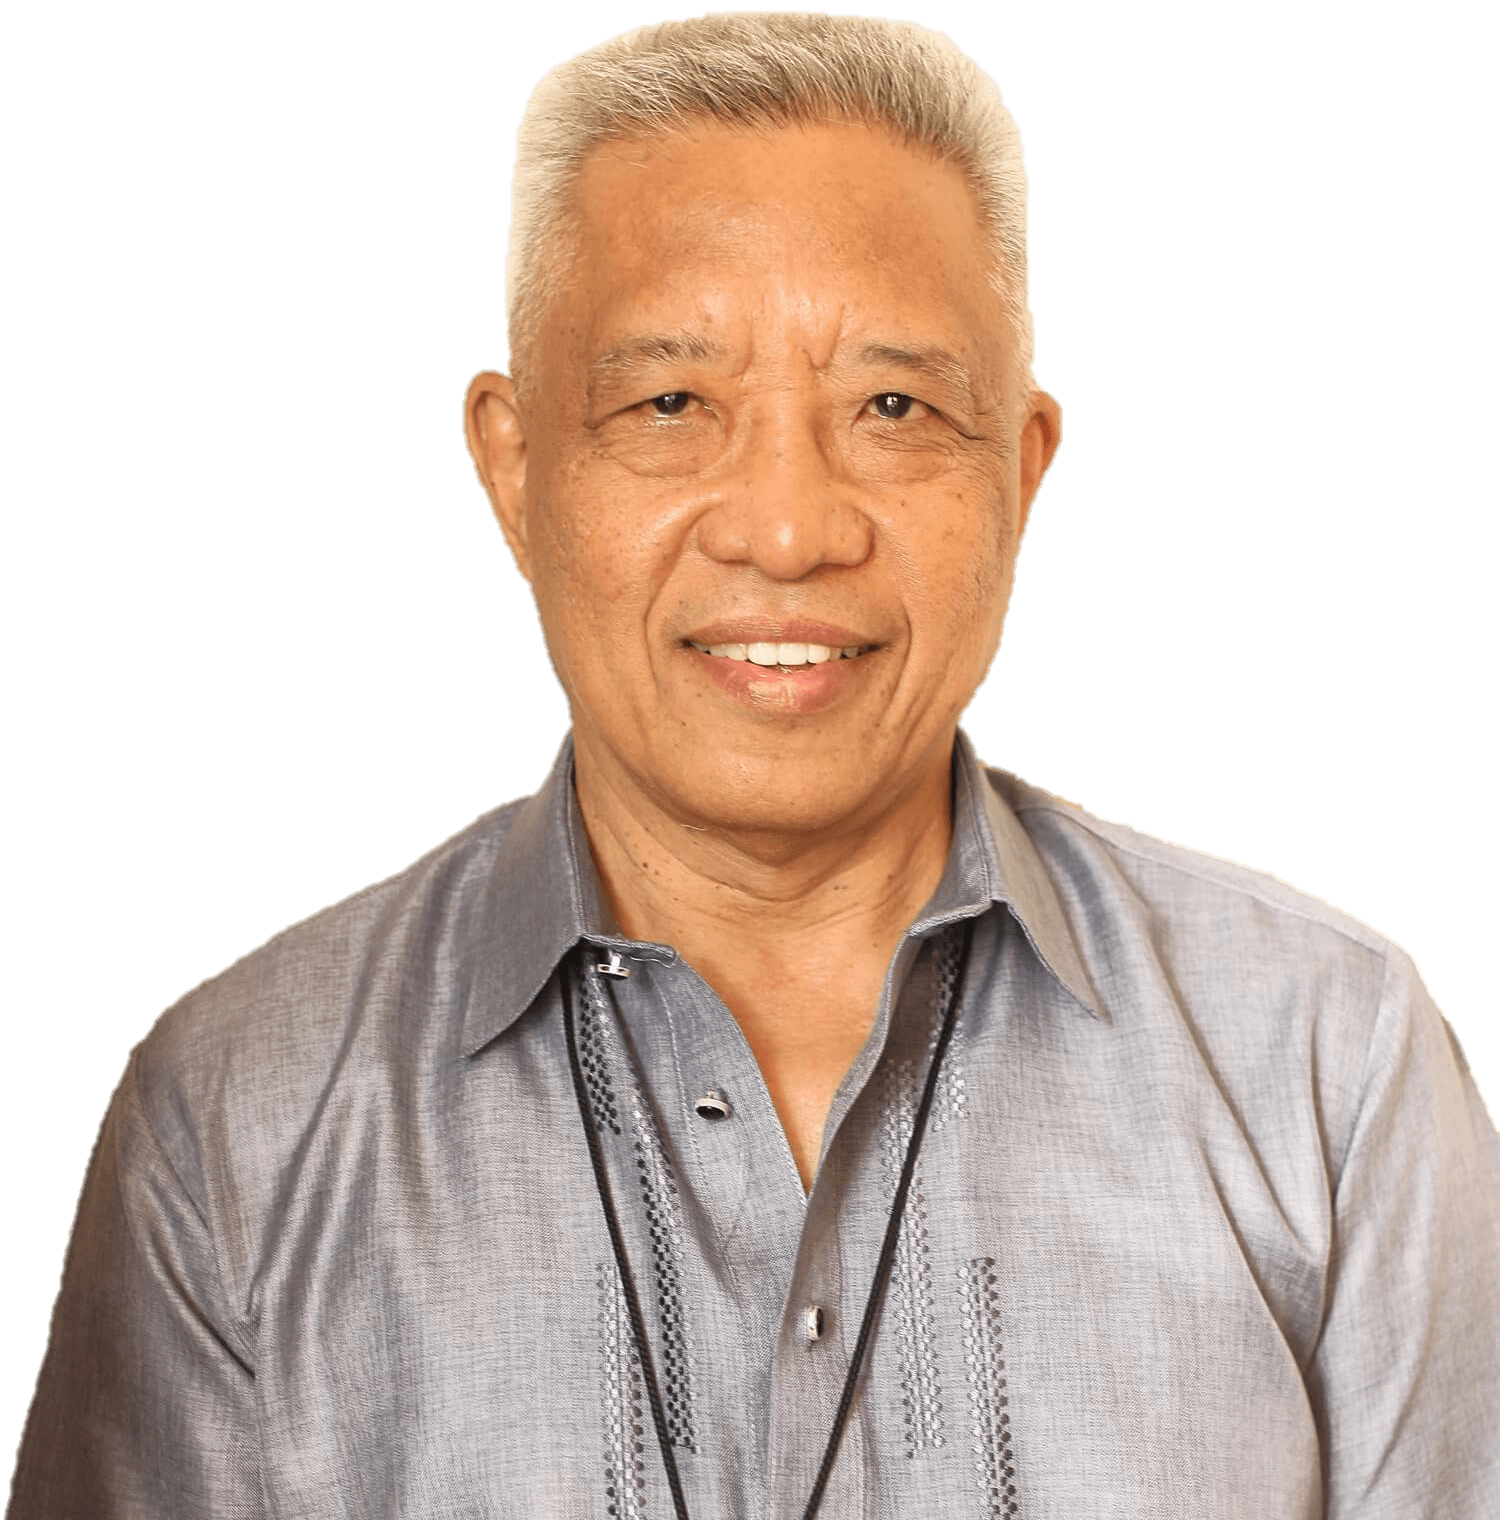 Fr. Benigno P. Beltran, SVD @ EduTECH Philippines 2018